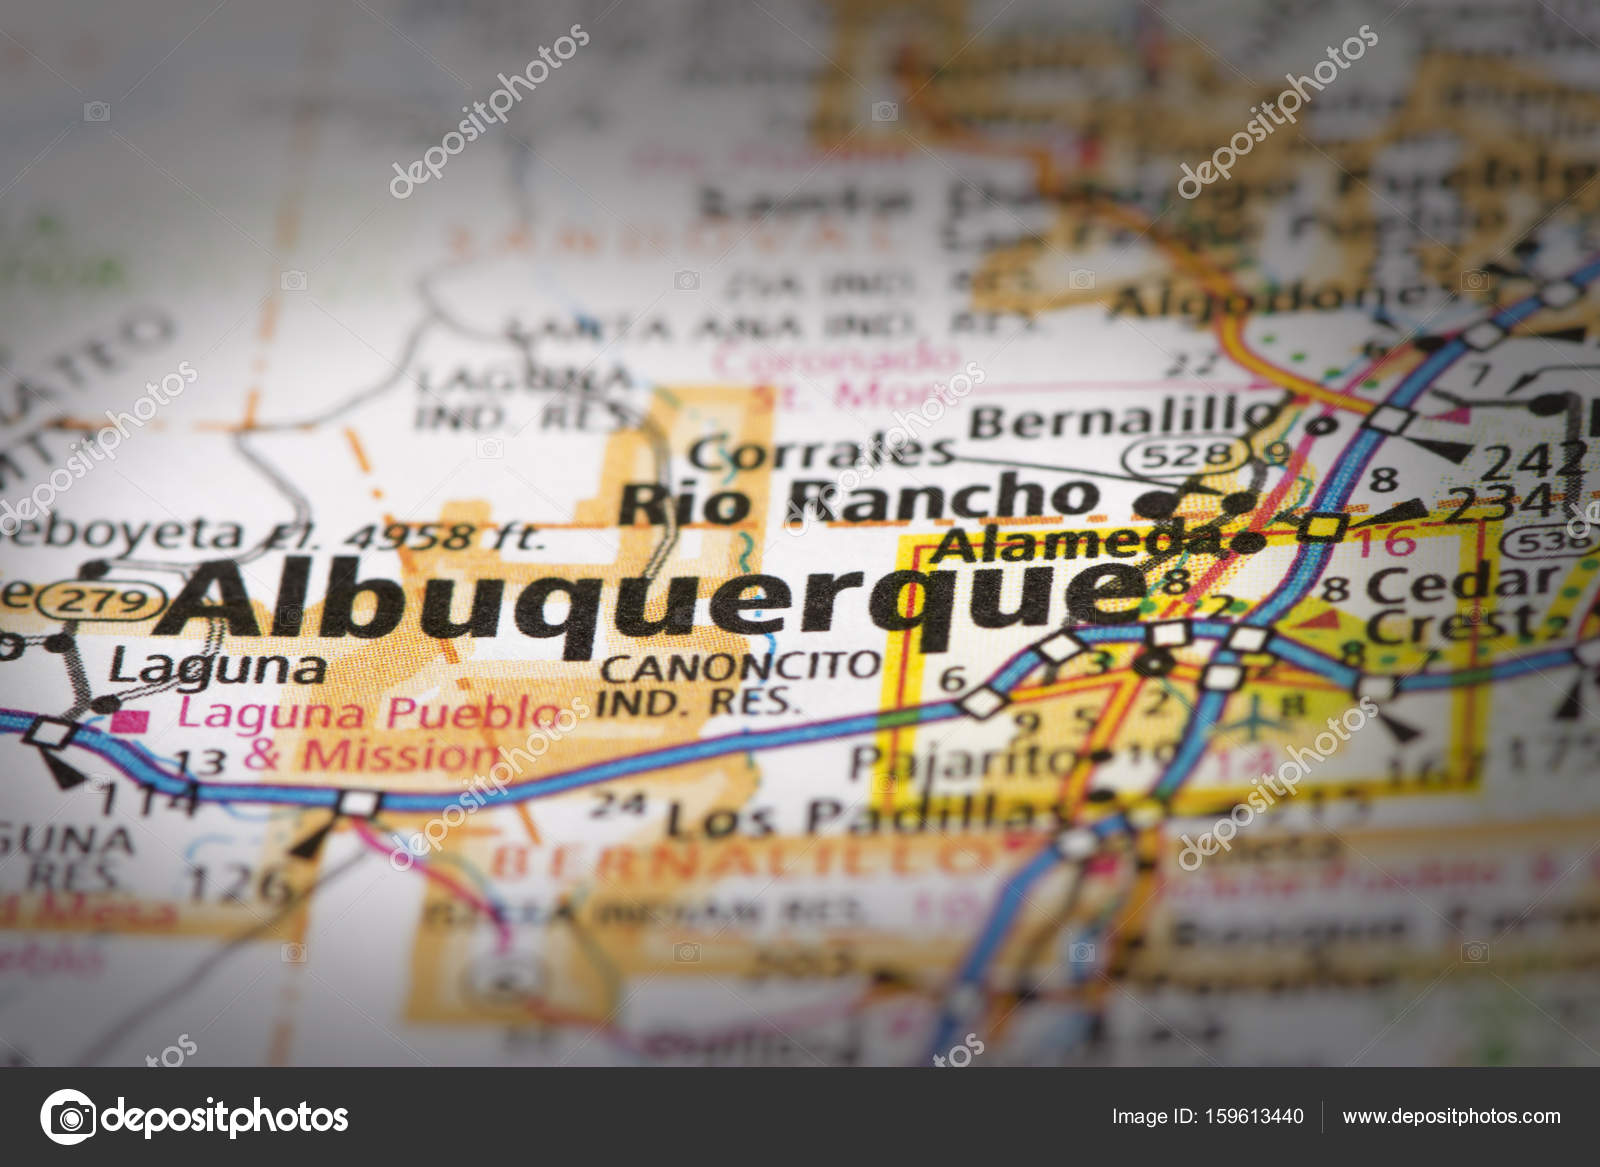 Albuquerque on map — Stock Photo © icemanj #159613440